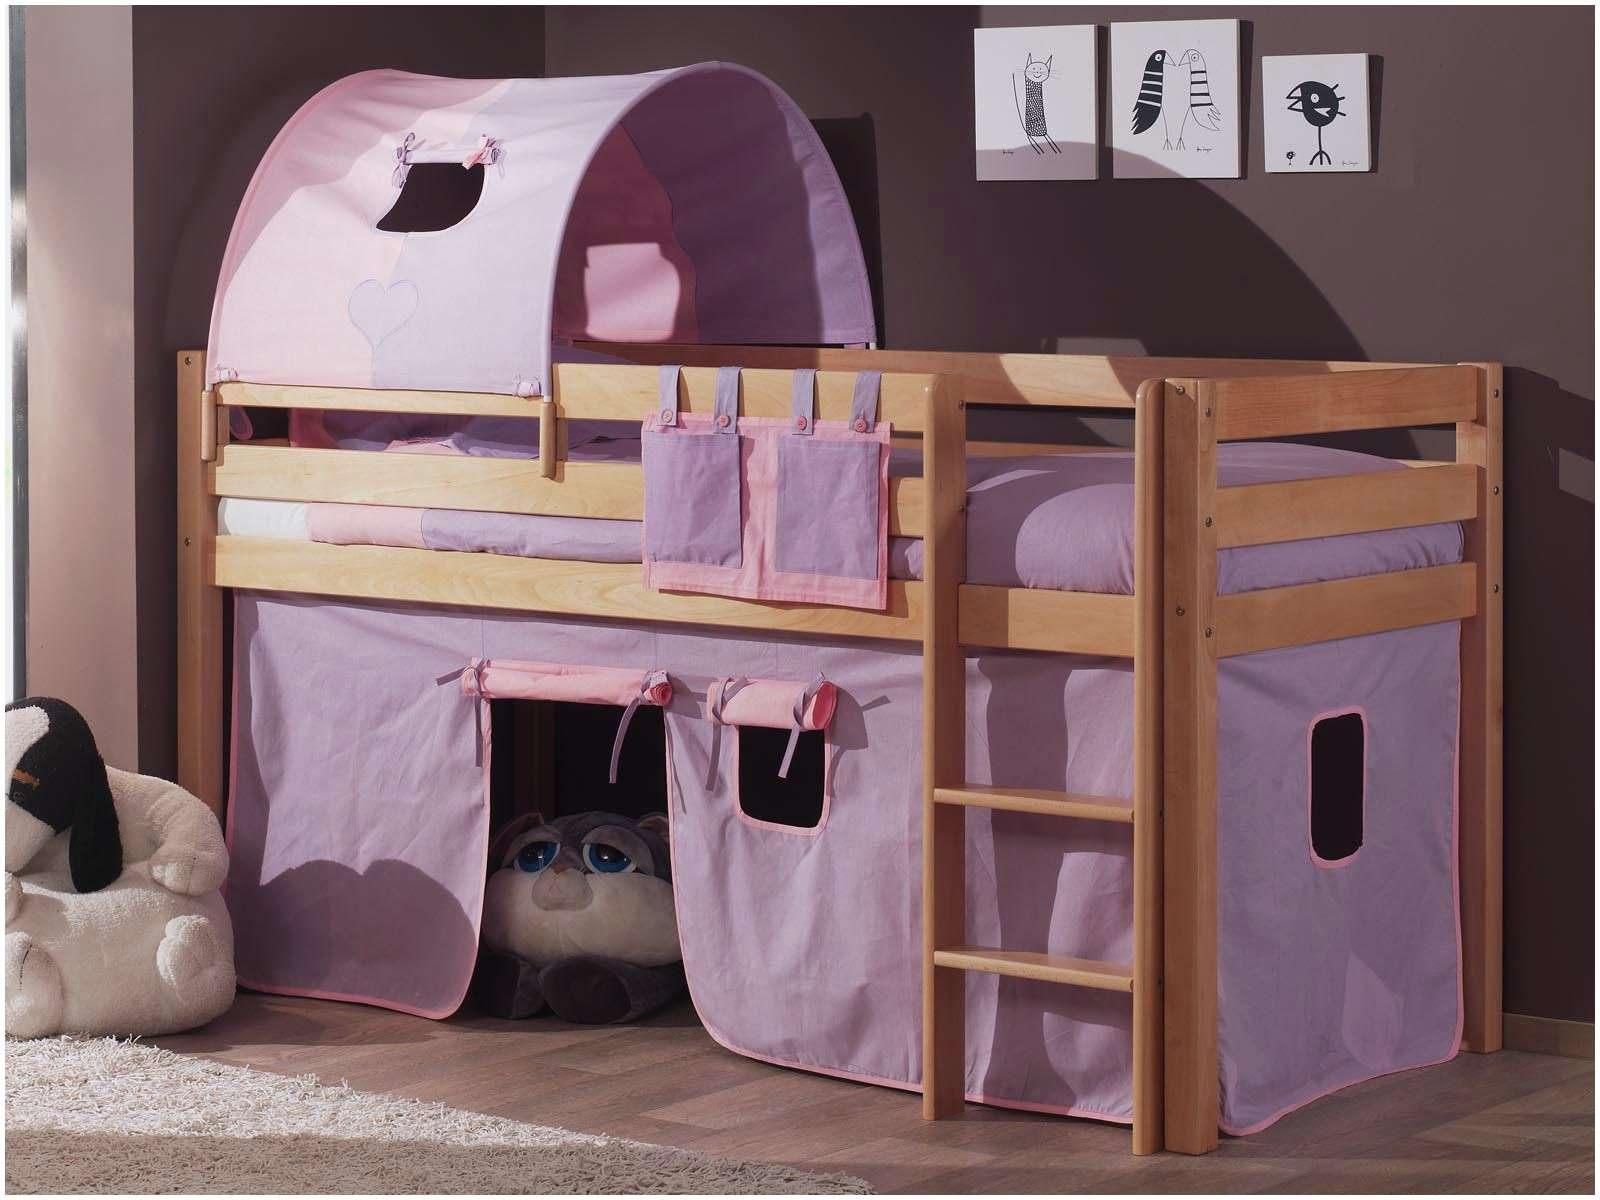 Ikea Lit Cabane Meilleur De Elégant Lit Kura Cabane Pour Alternative Tunnel De Lit Ikea